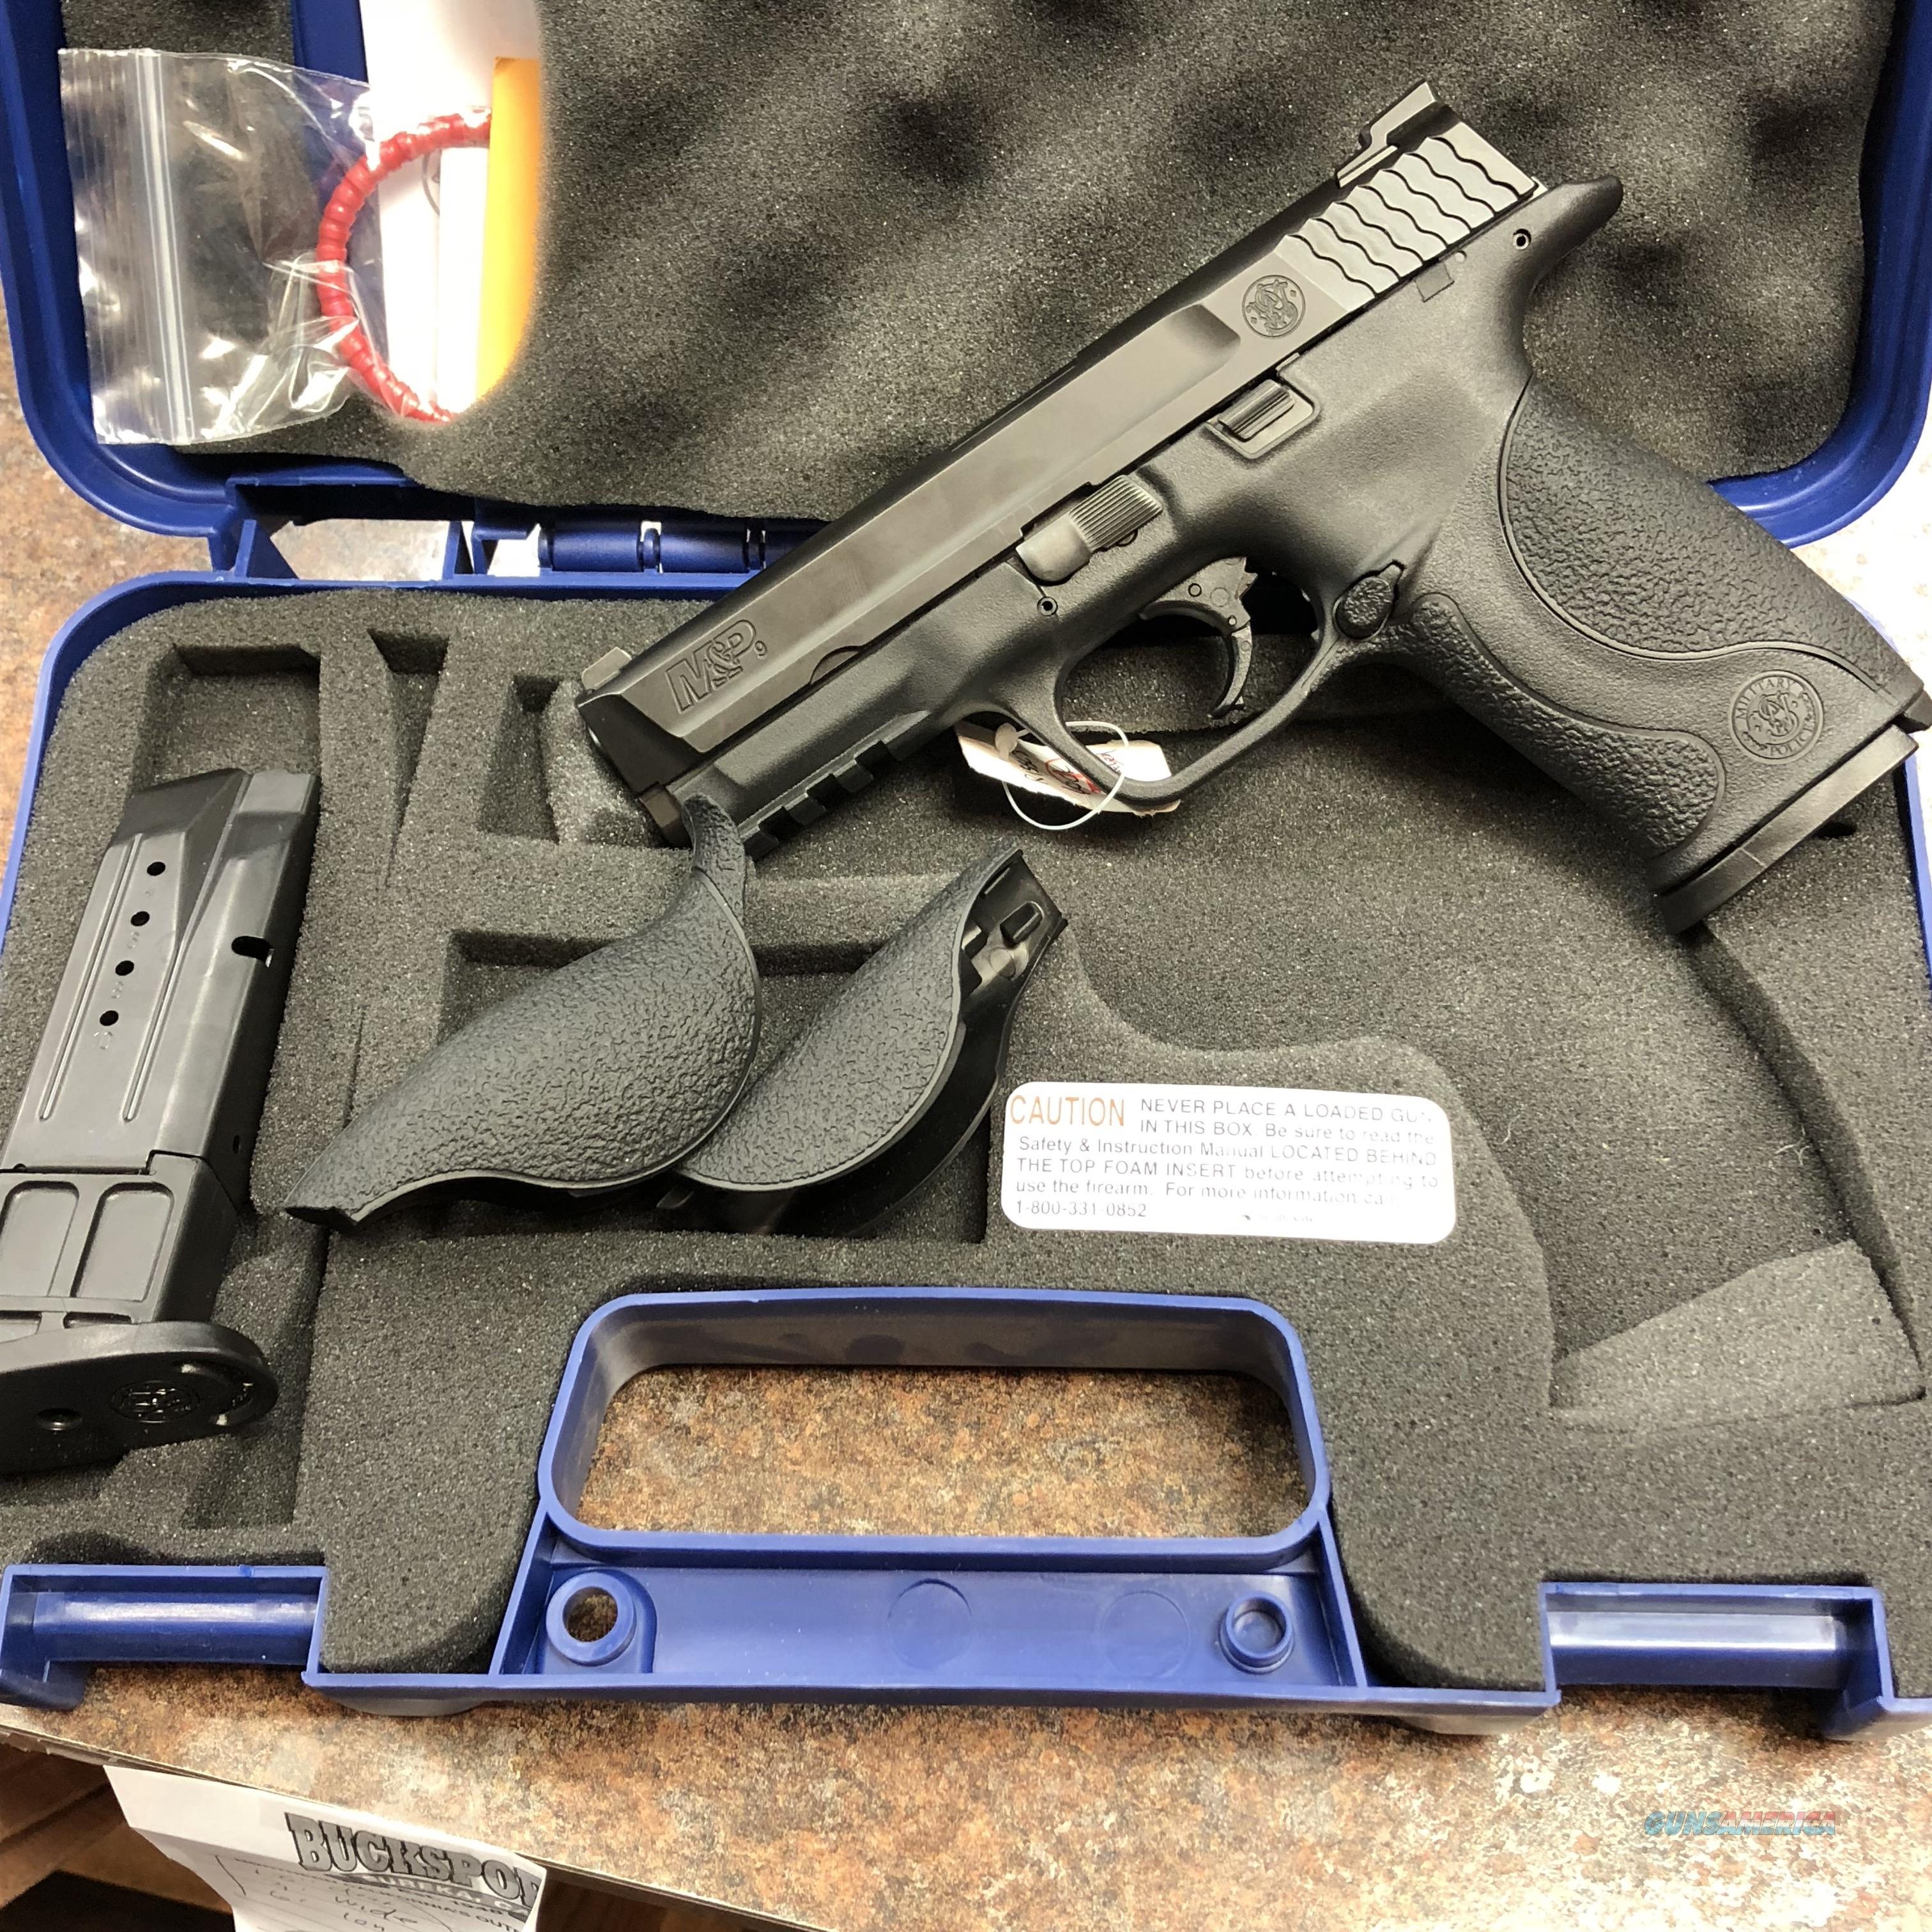 Smith & Wesson M&P9   Guns > Pistols > Smith & Wesson Pistols - Autos > Polymer Frame